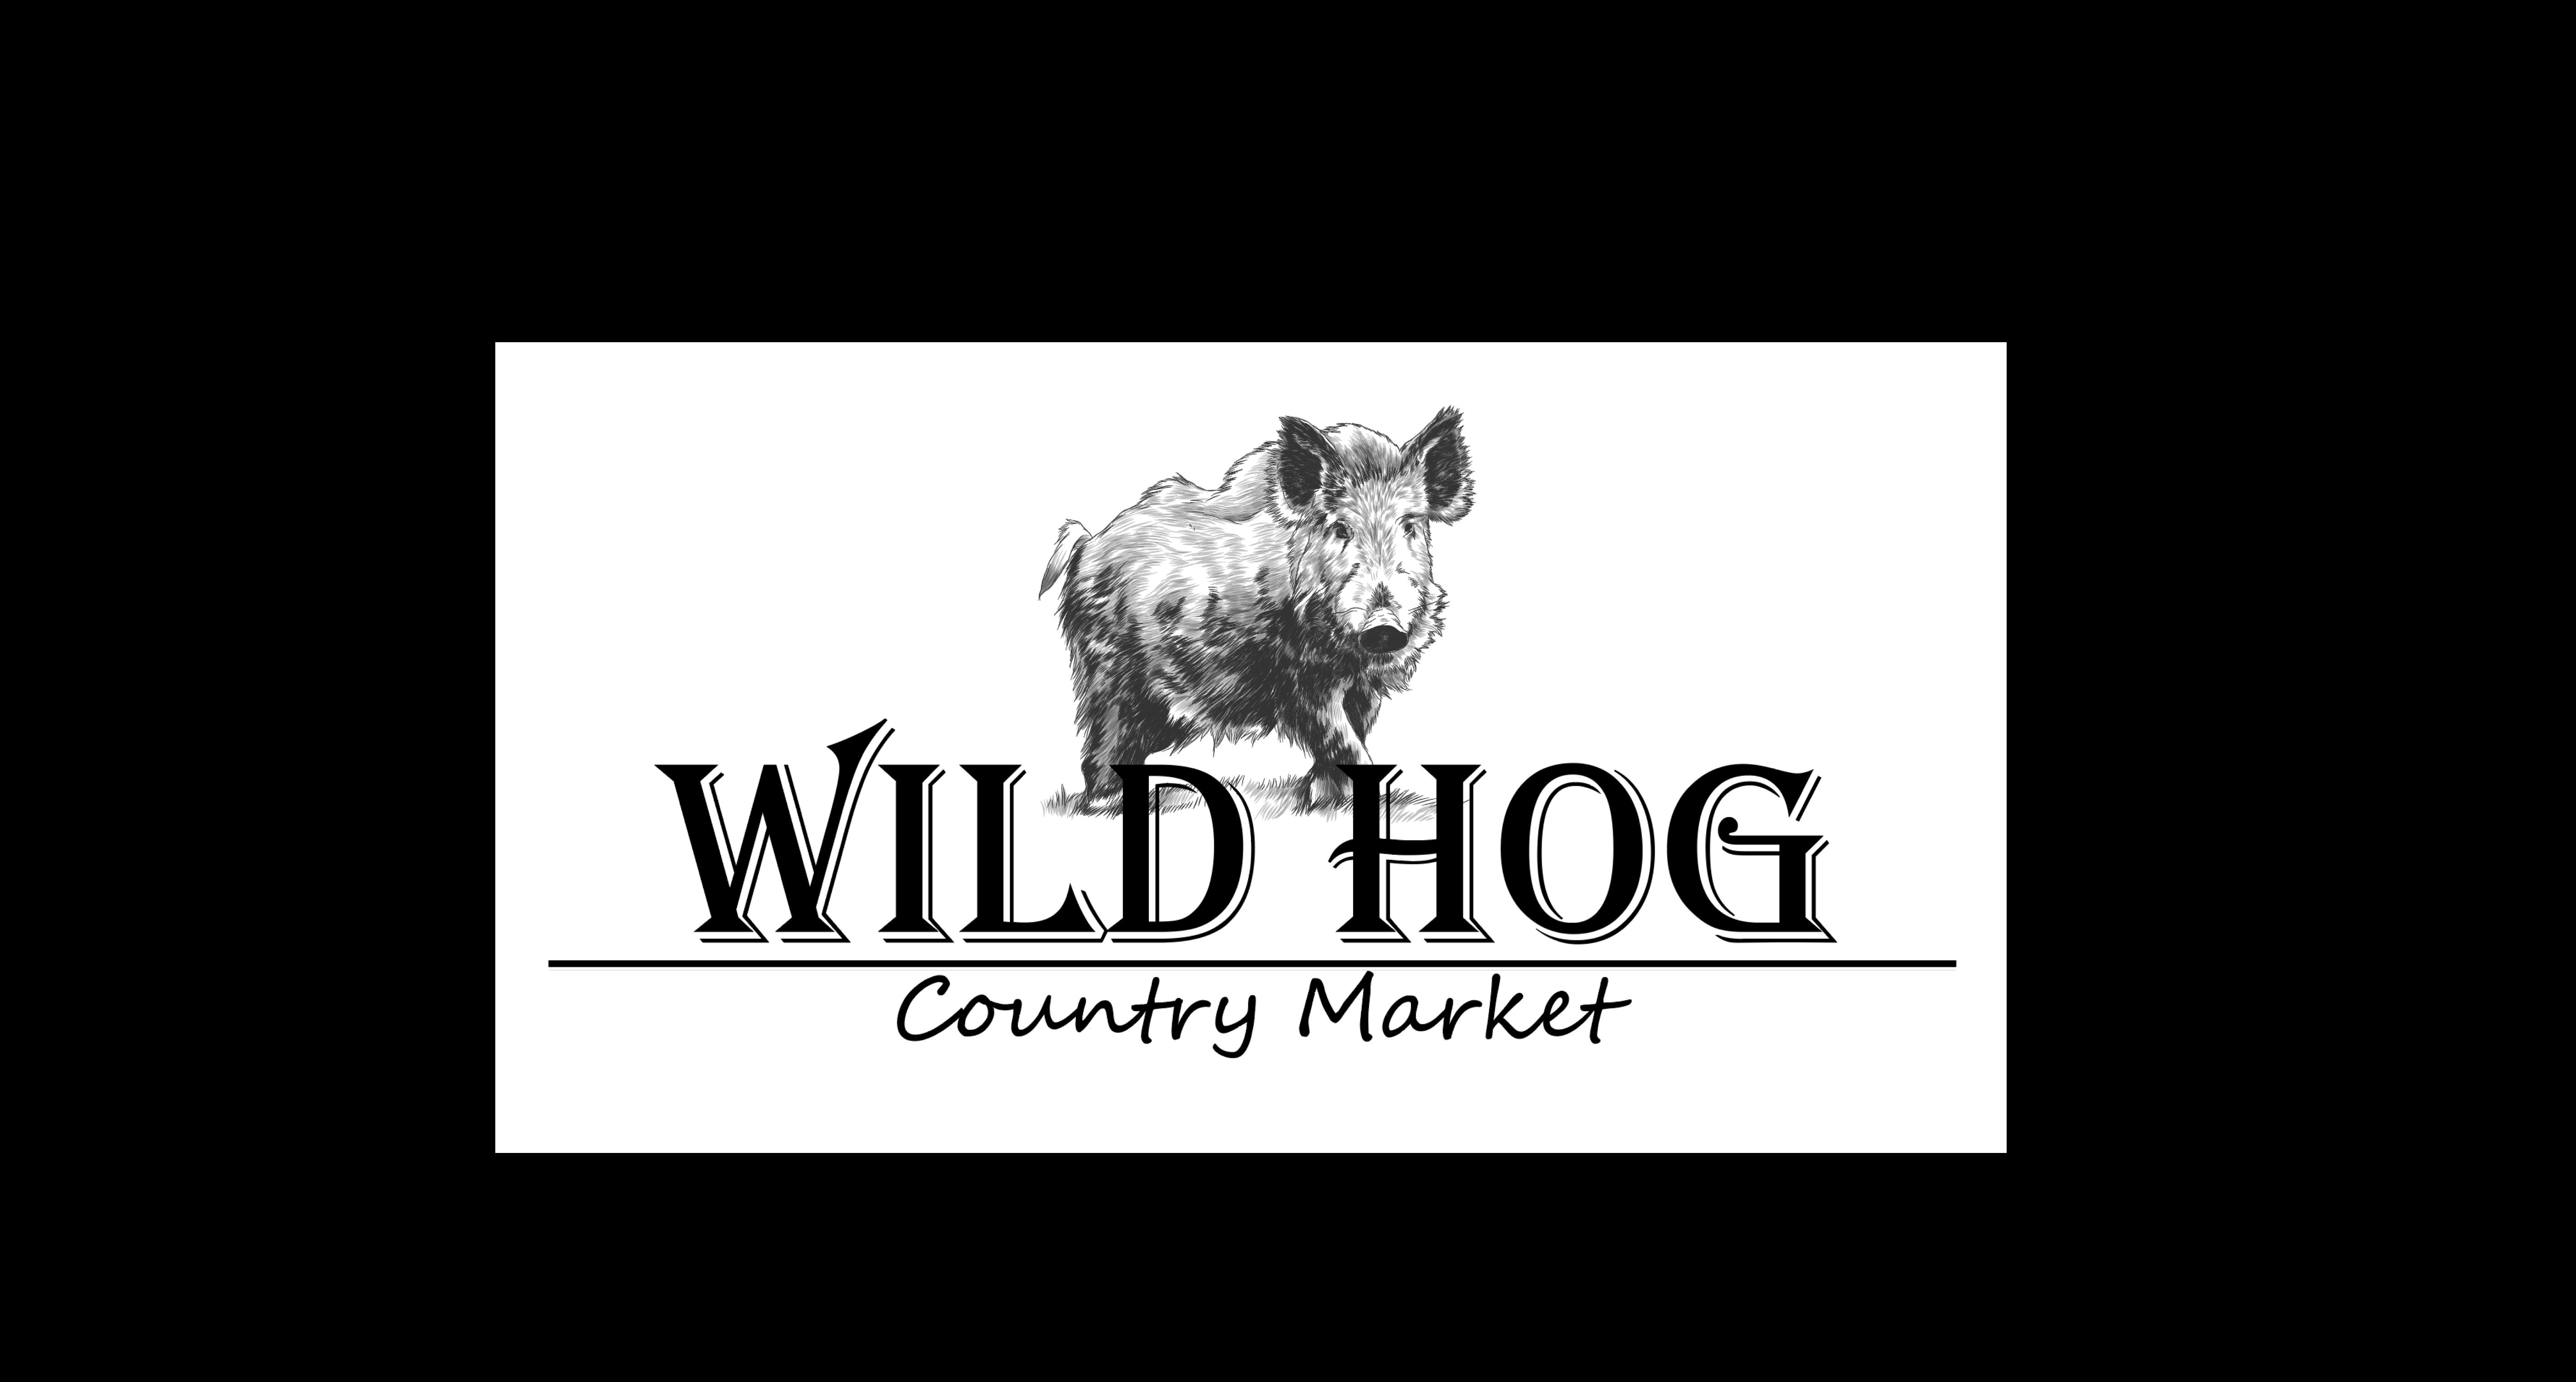 Wild Hog Country Market